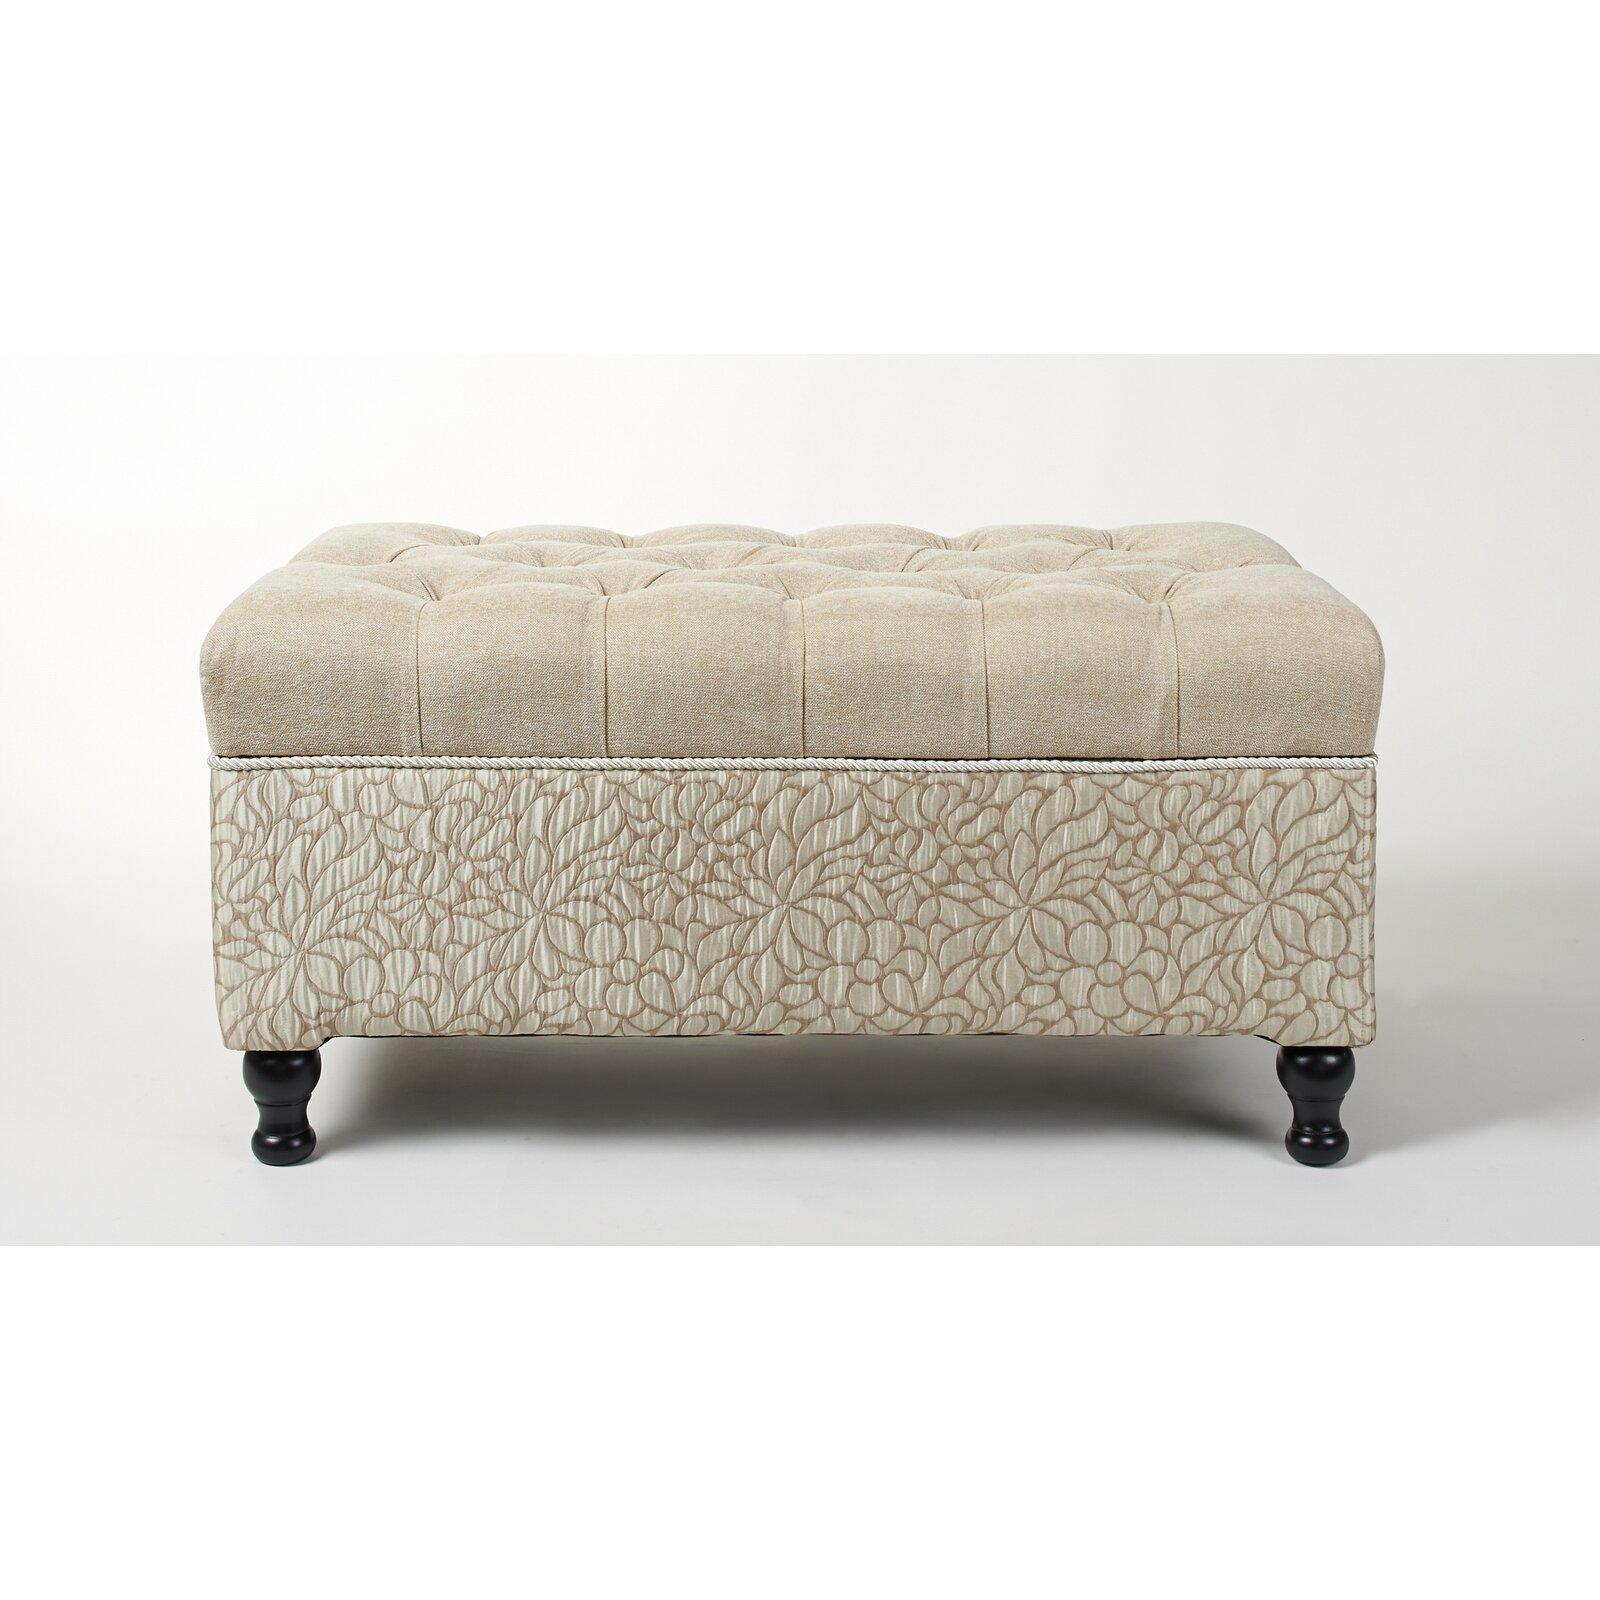 jennifer taylor naomi upholstered storage bedroom bench & reviews | wayfair